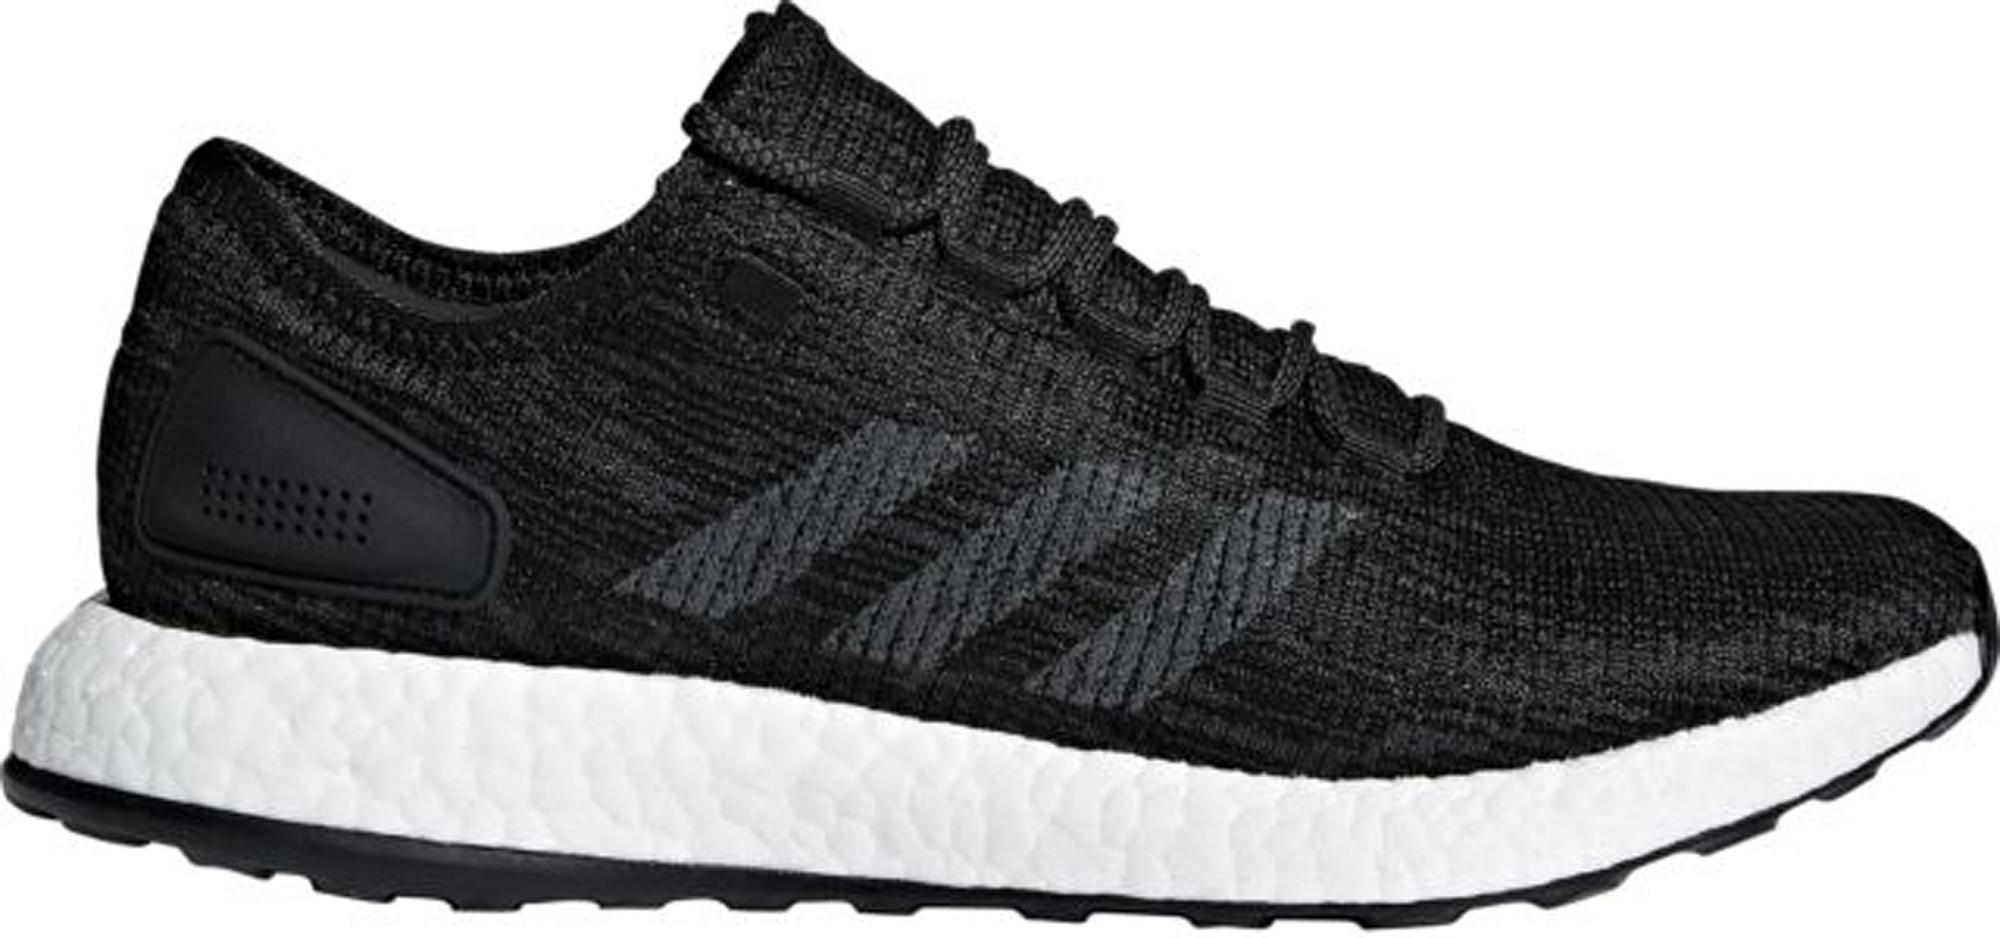 adidas Pureboost Core Black Dark Solid